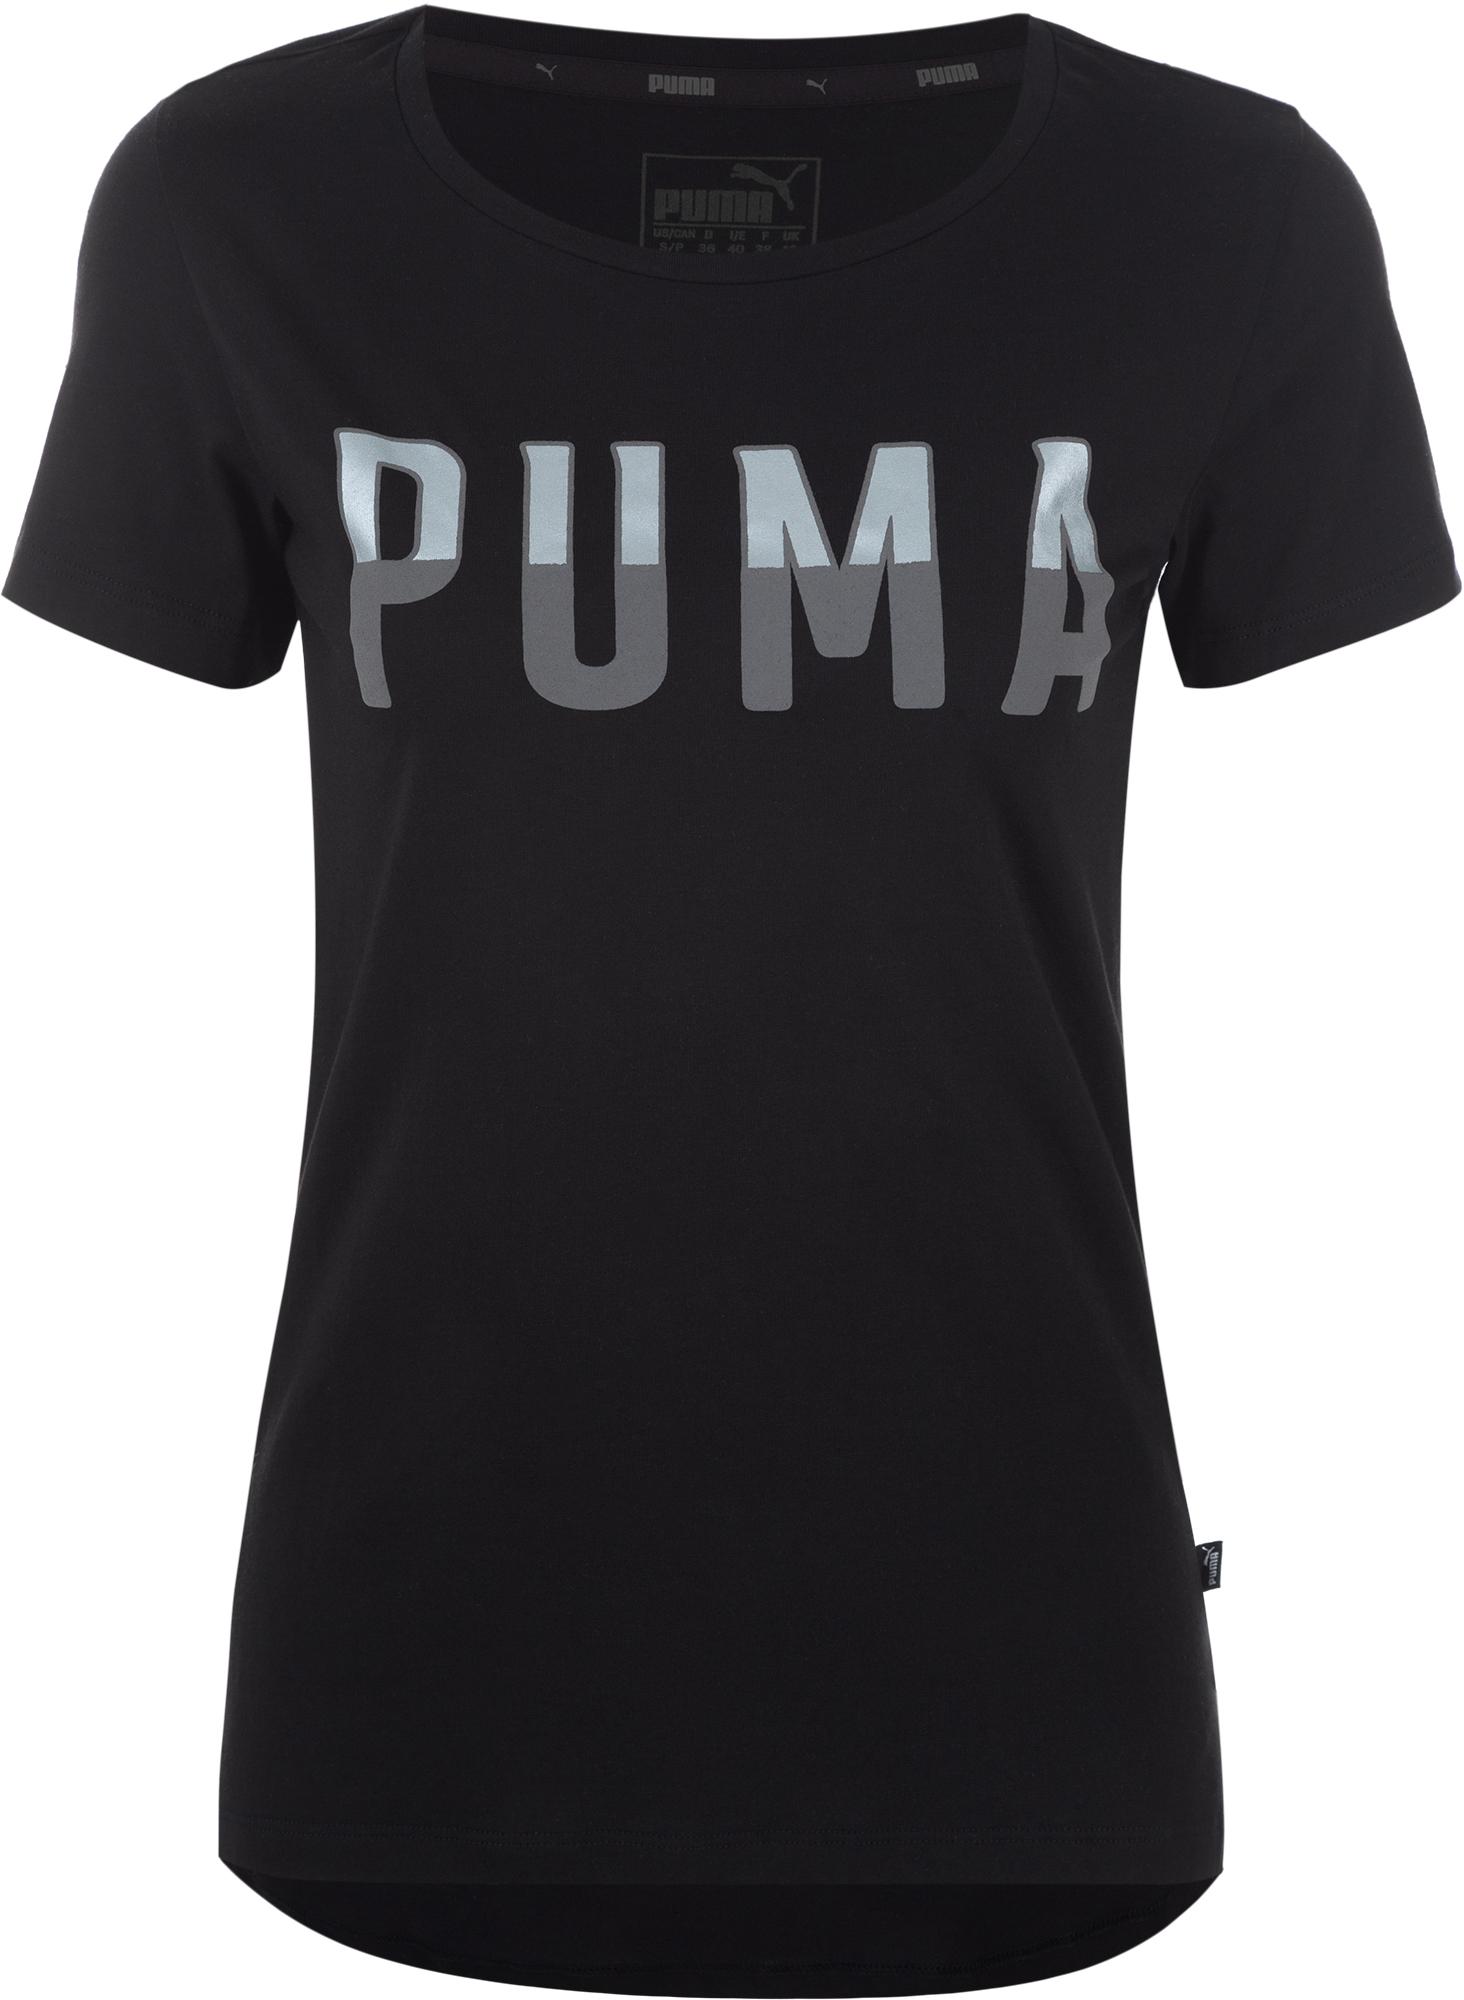 Puma Футболка женская Puma Athletic, размер 48-50